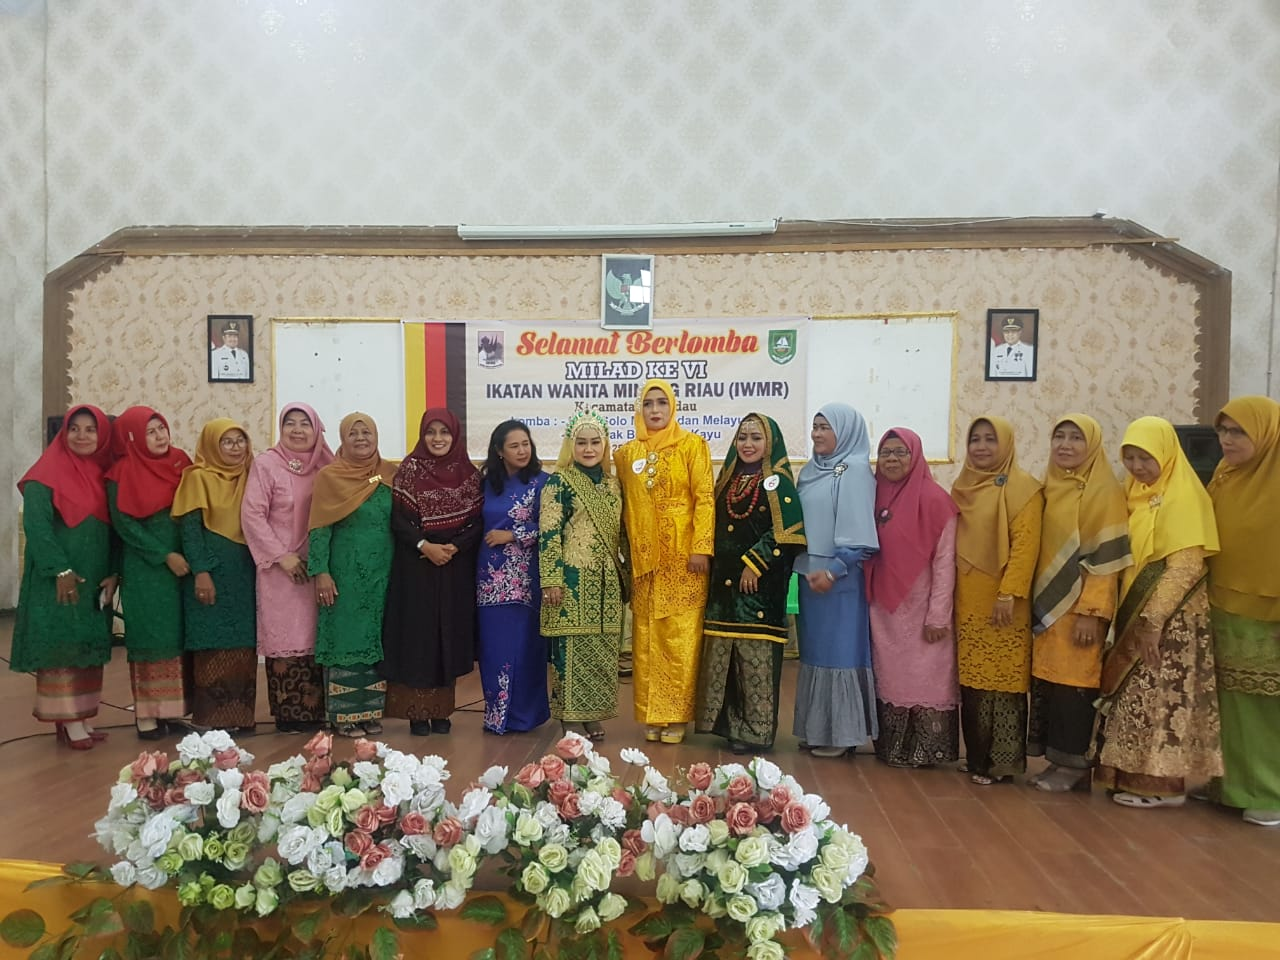 Anggota DPRD Riau Mira Roza Menghadiri, Milad ke VI Ikatan Wanita Minang Riau di Duri